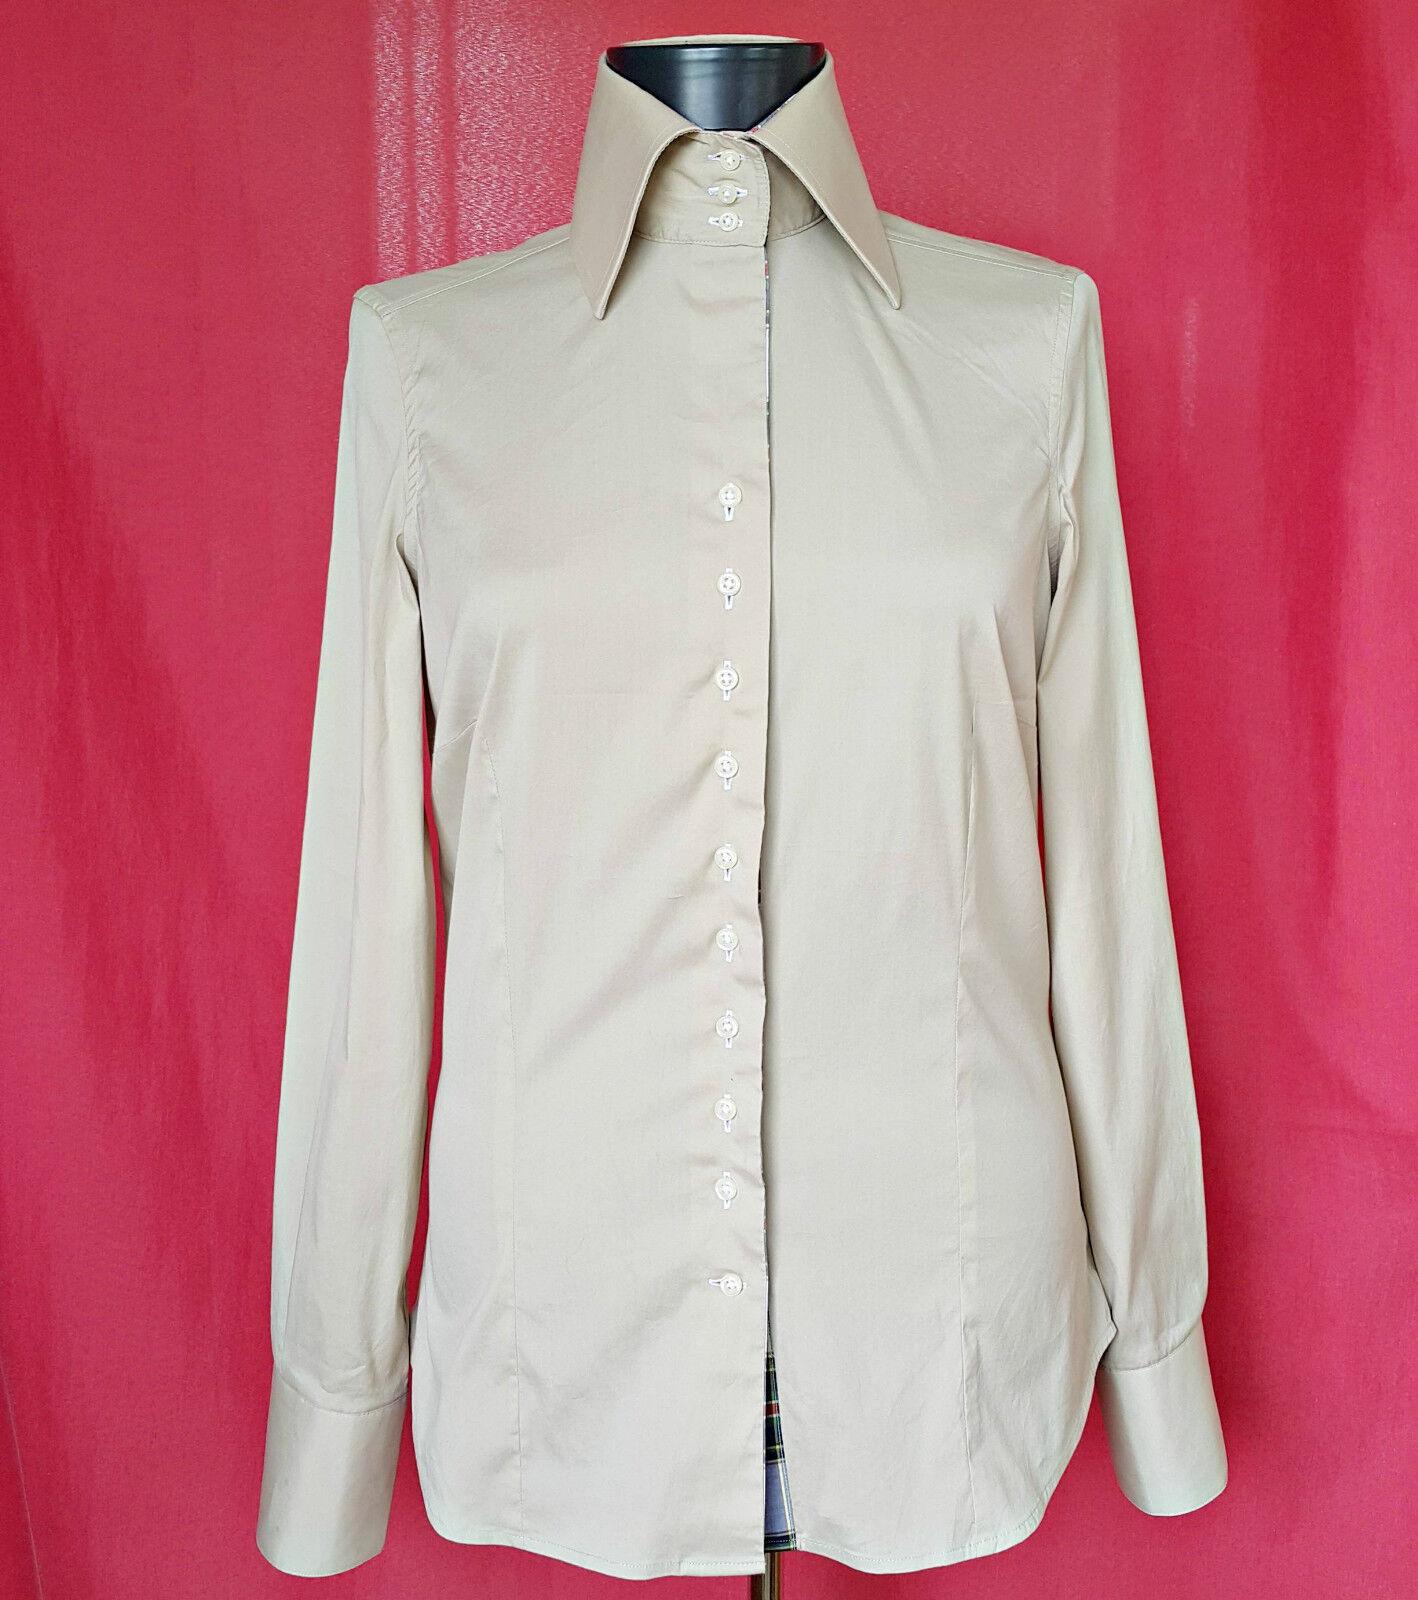 AUTHENTIC CIRCLE OF GENTLEMEN SOLID KHAKI damen DRESS SHIRT  US 6